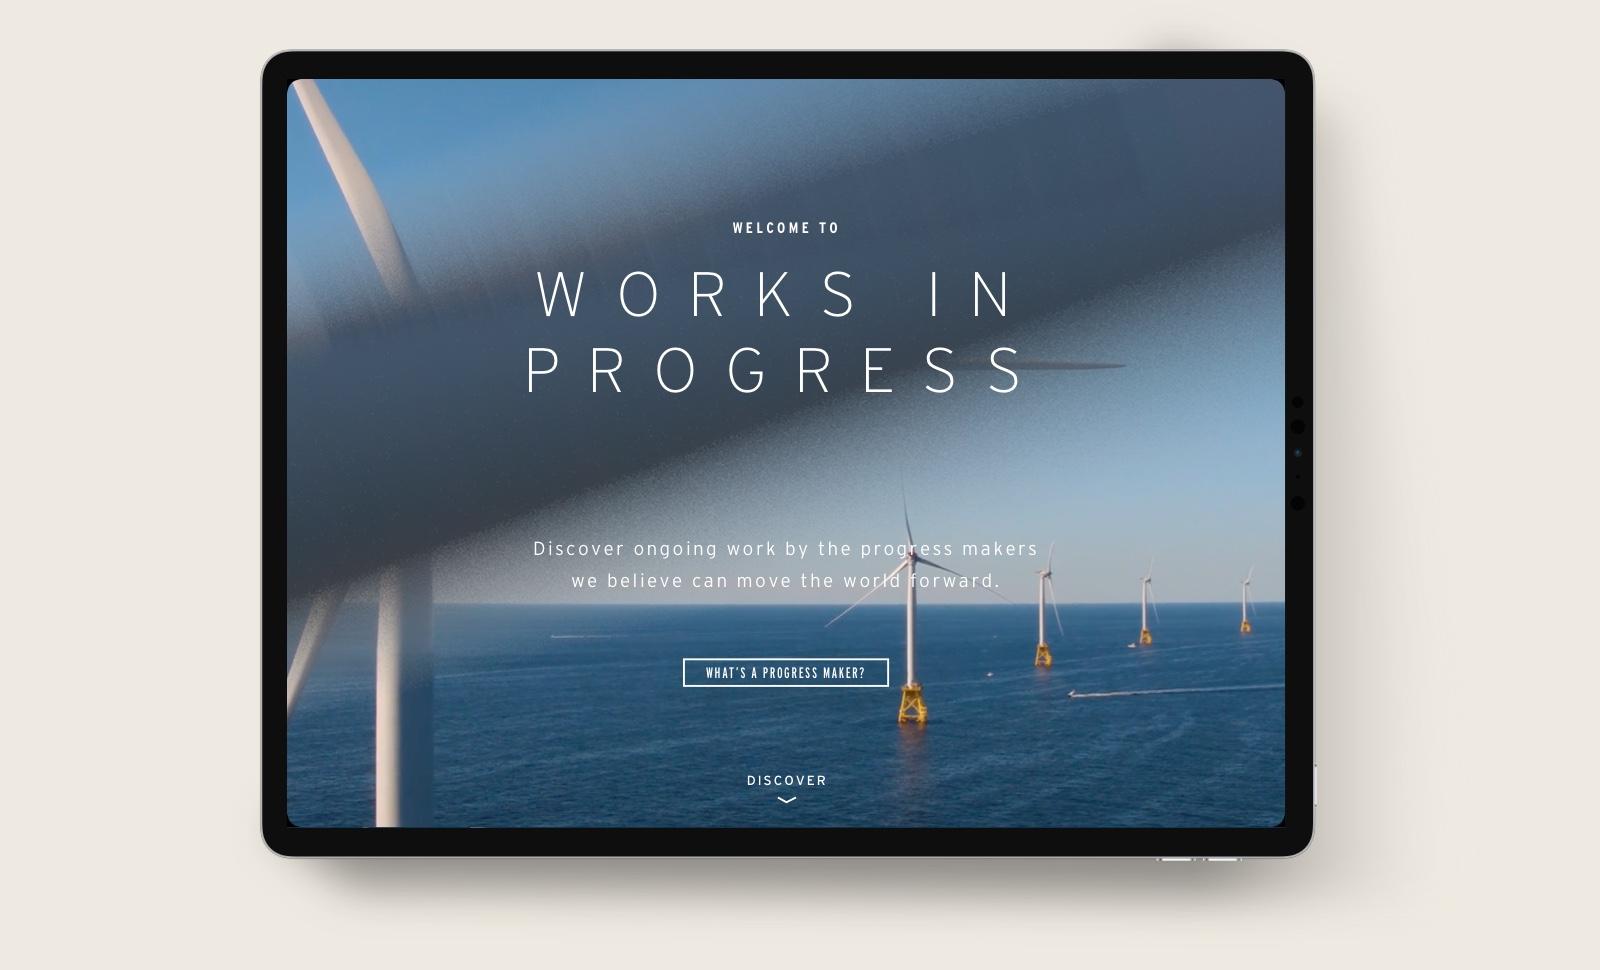 progress-makers-1.jpg